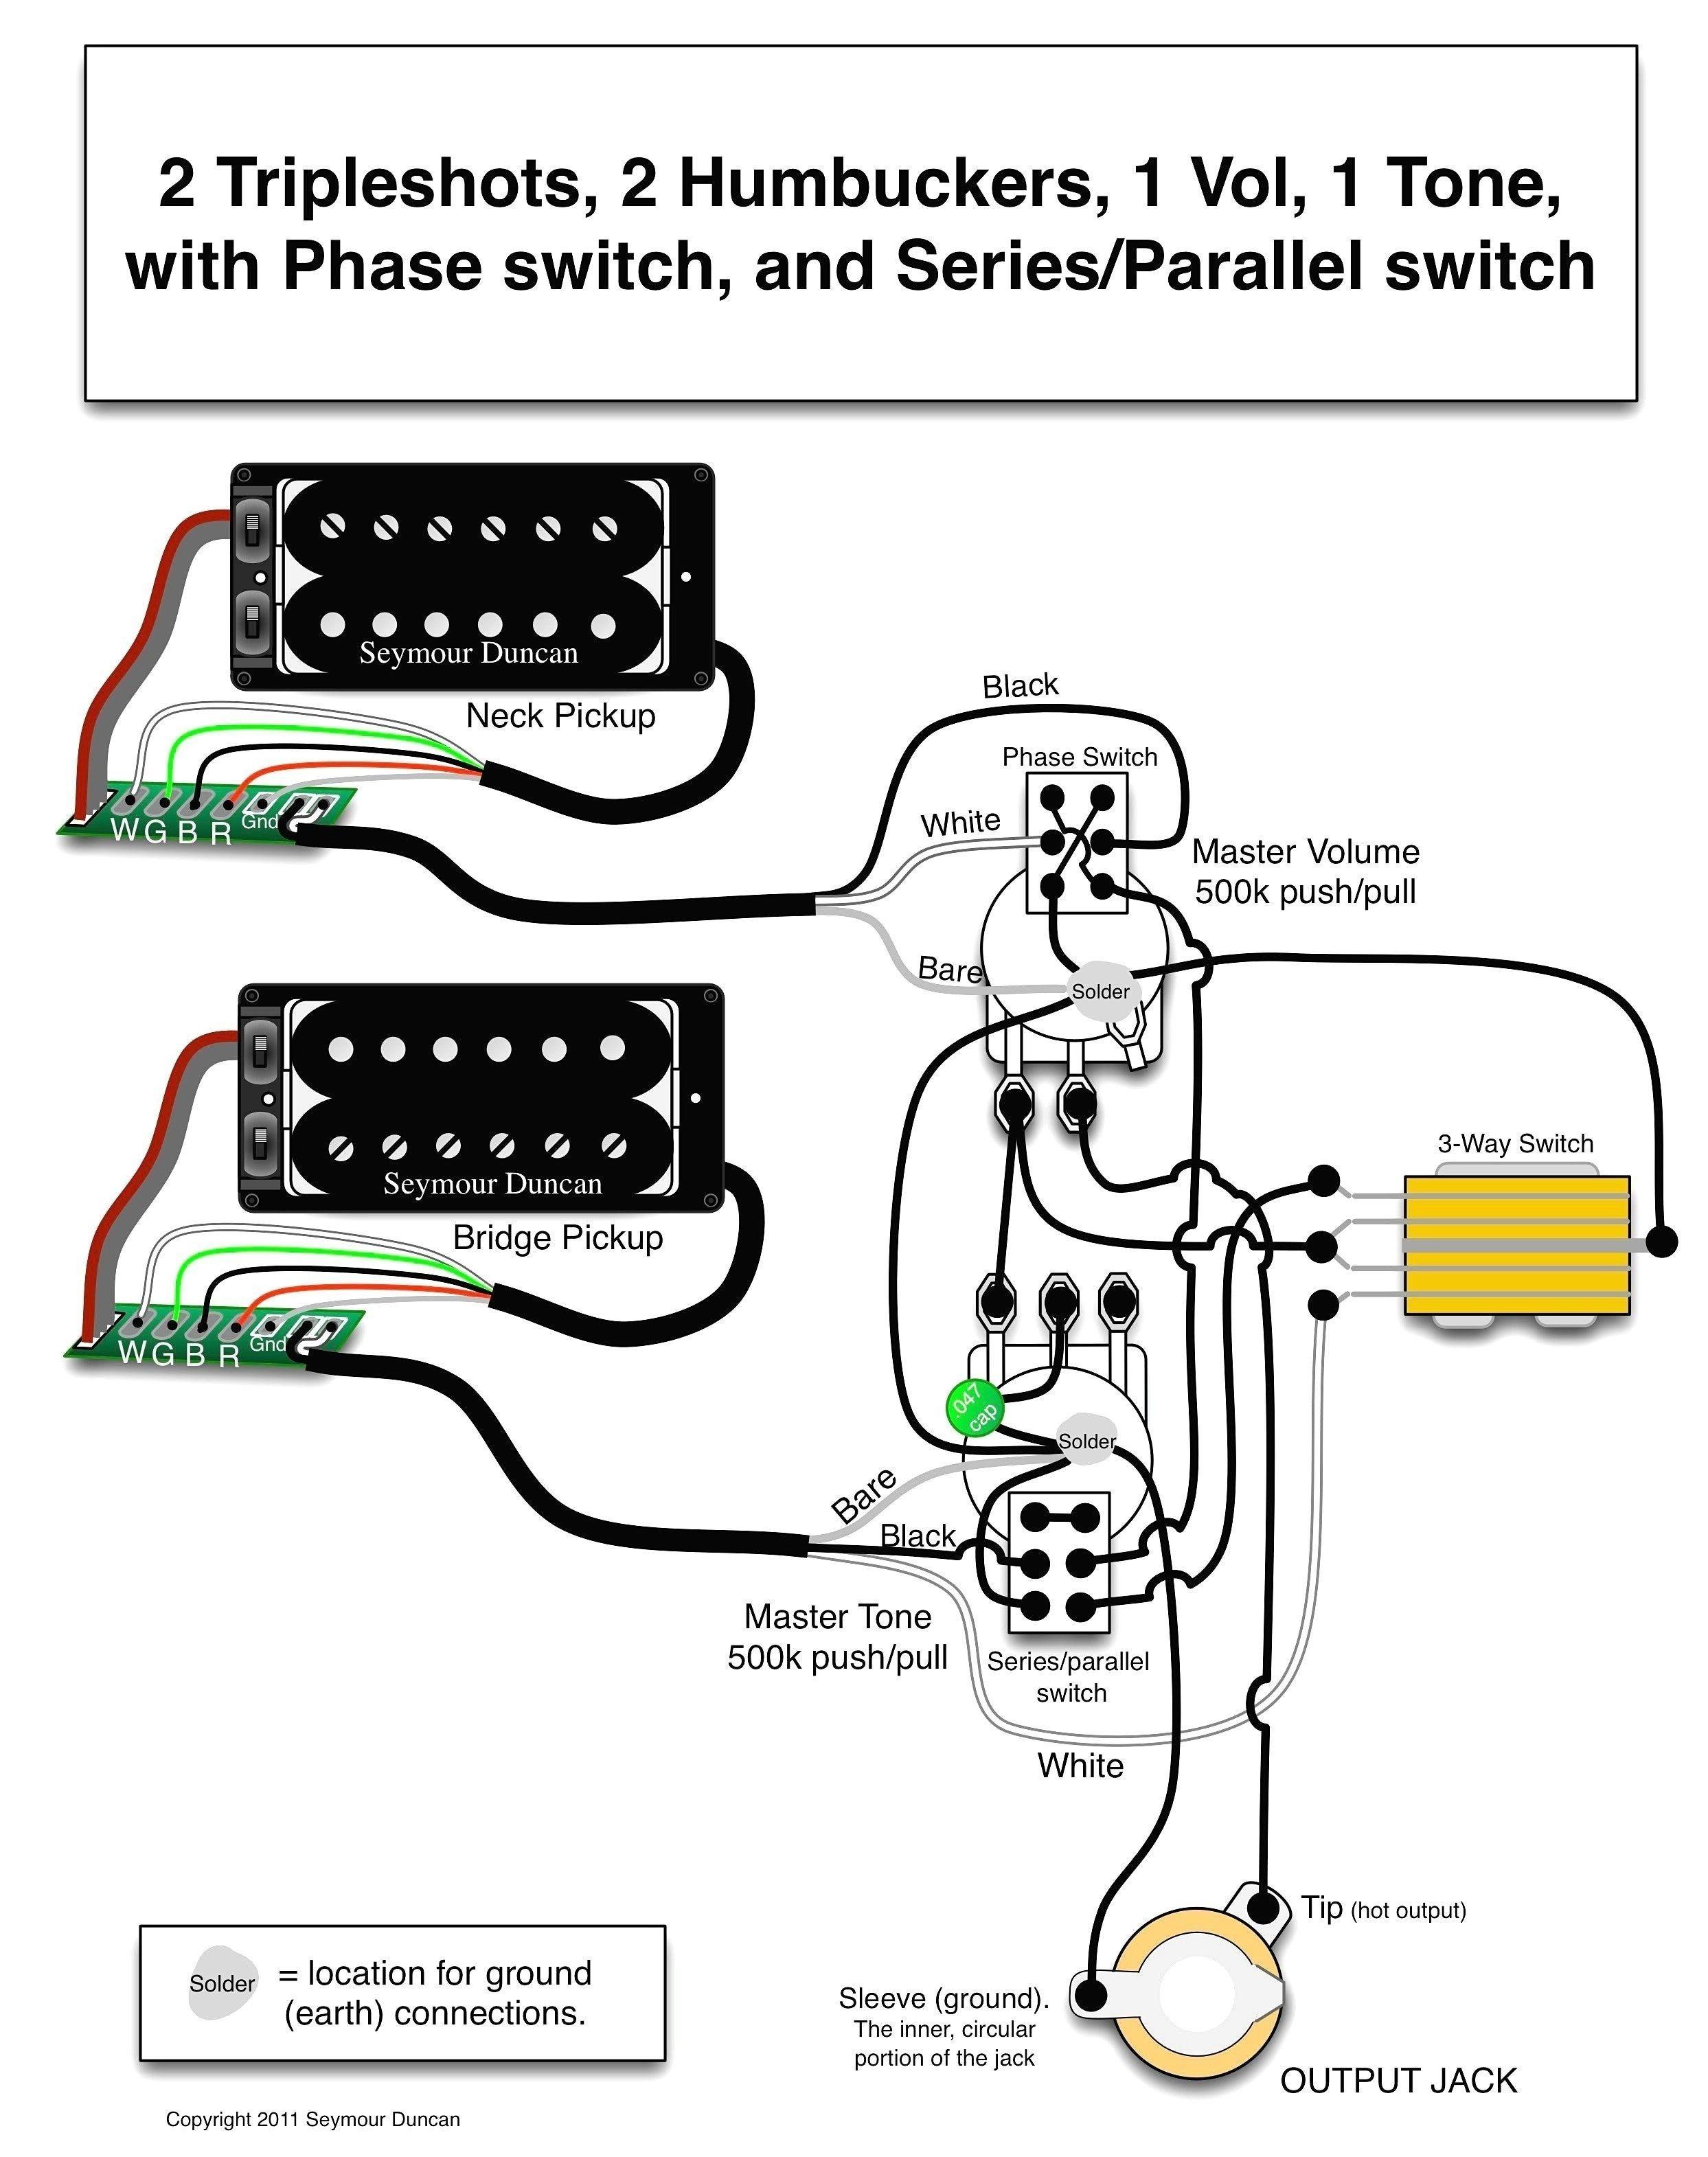 hight resolution of new epiphone les paul coil tap wiring diagram diagram diagramsample diagramtemplate wiringdiagram diagramchart worksheet worksheettemplate